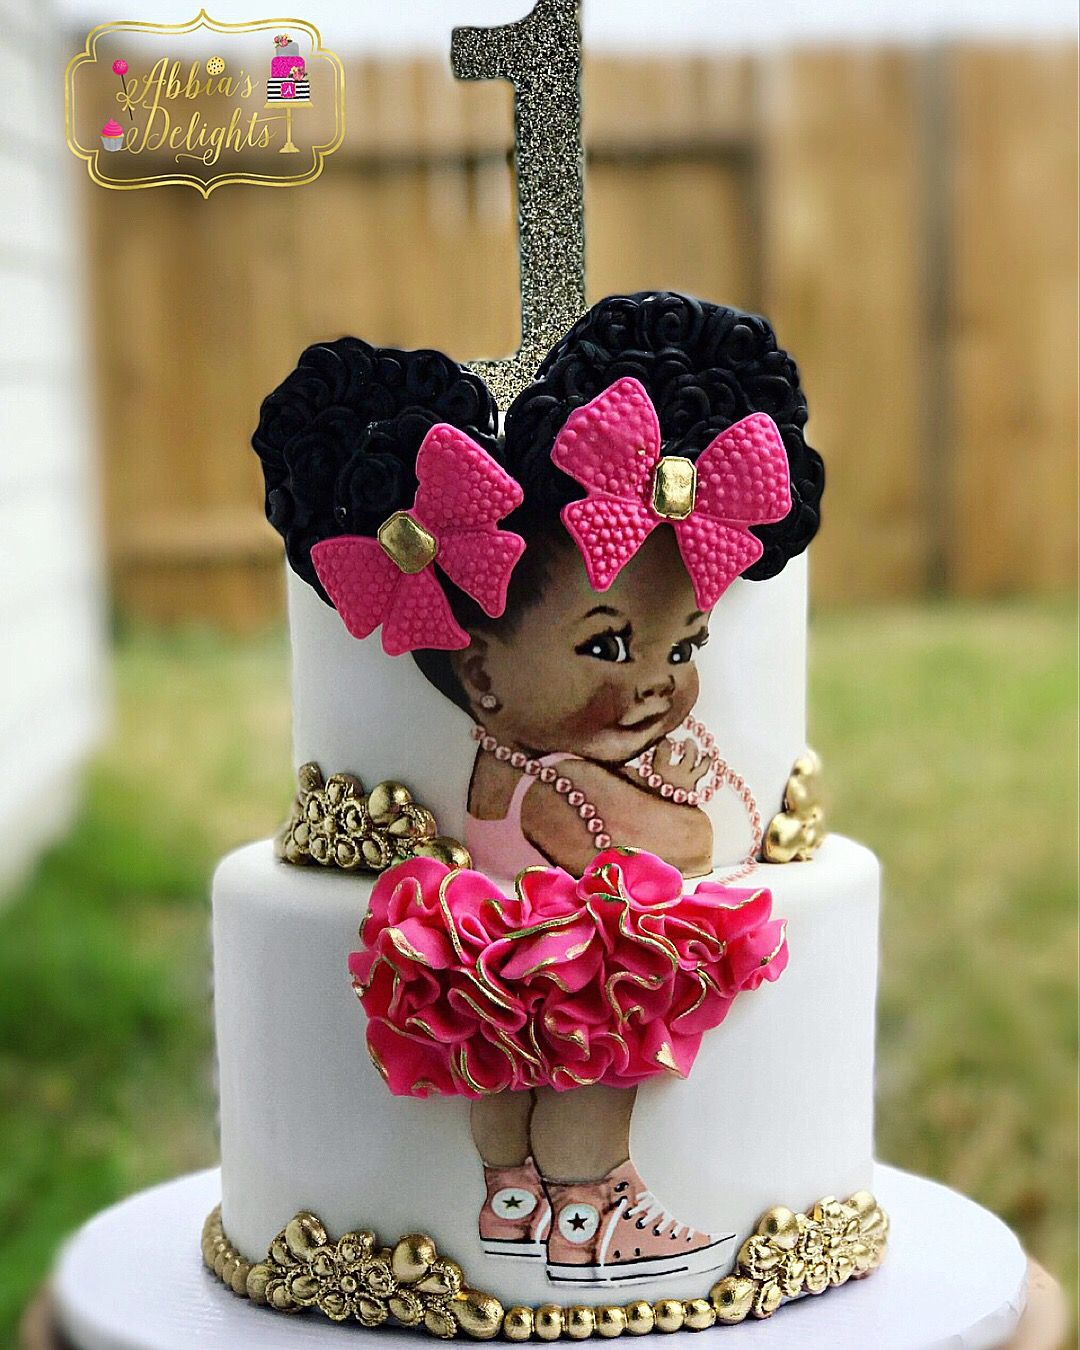 Amazing Cake Recipes From Scratch: Afro Puff Baby Cake. Baby Shower Cake, Birthday Cake